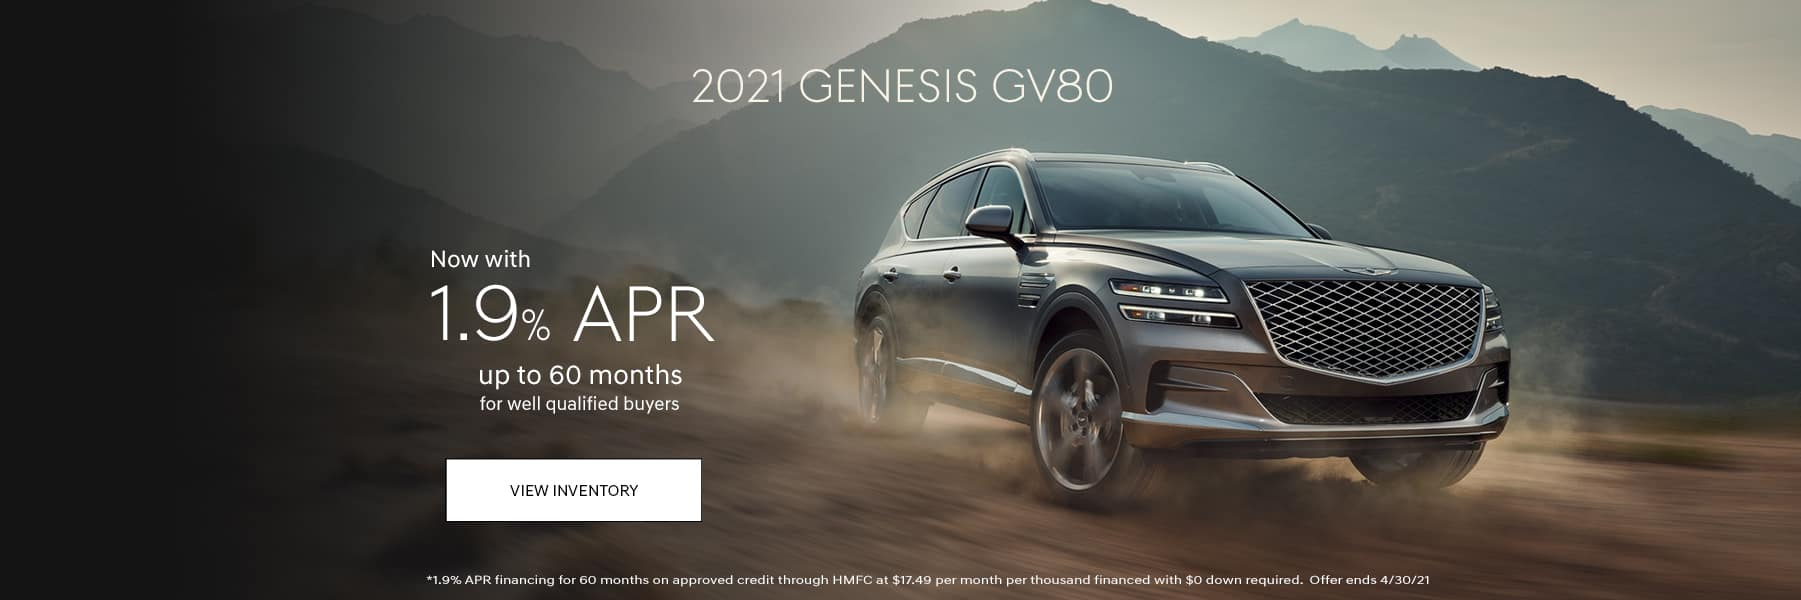 2021-Genesis-GV80-Apr21